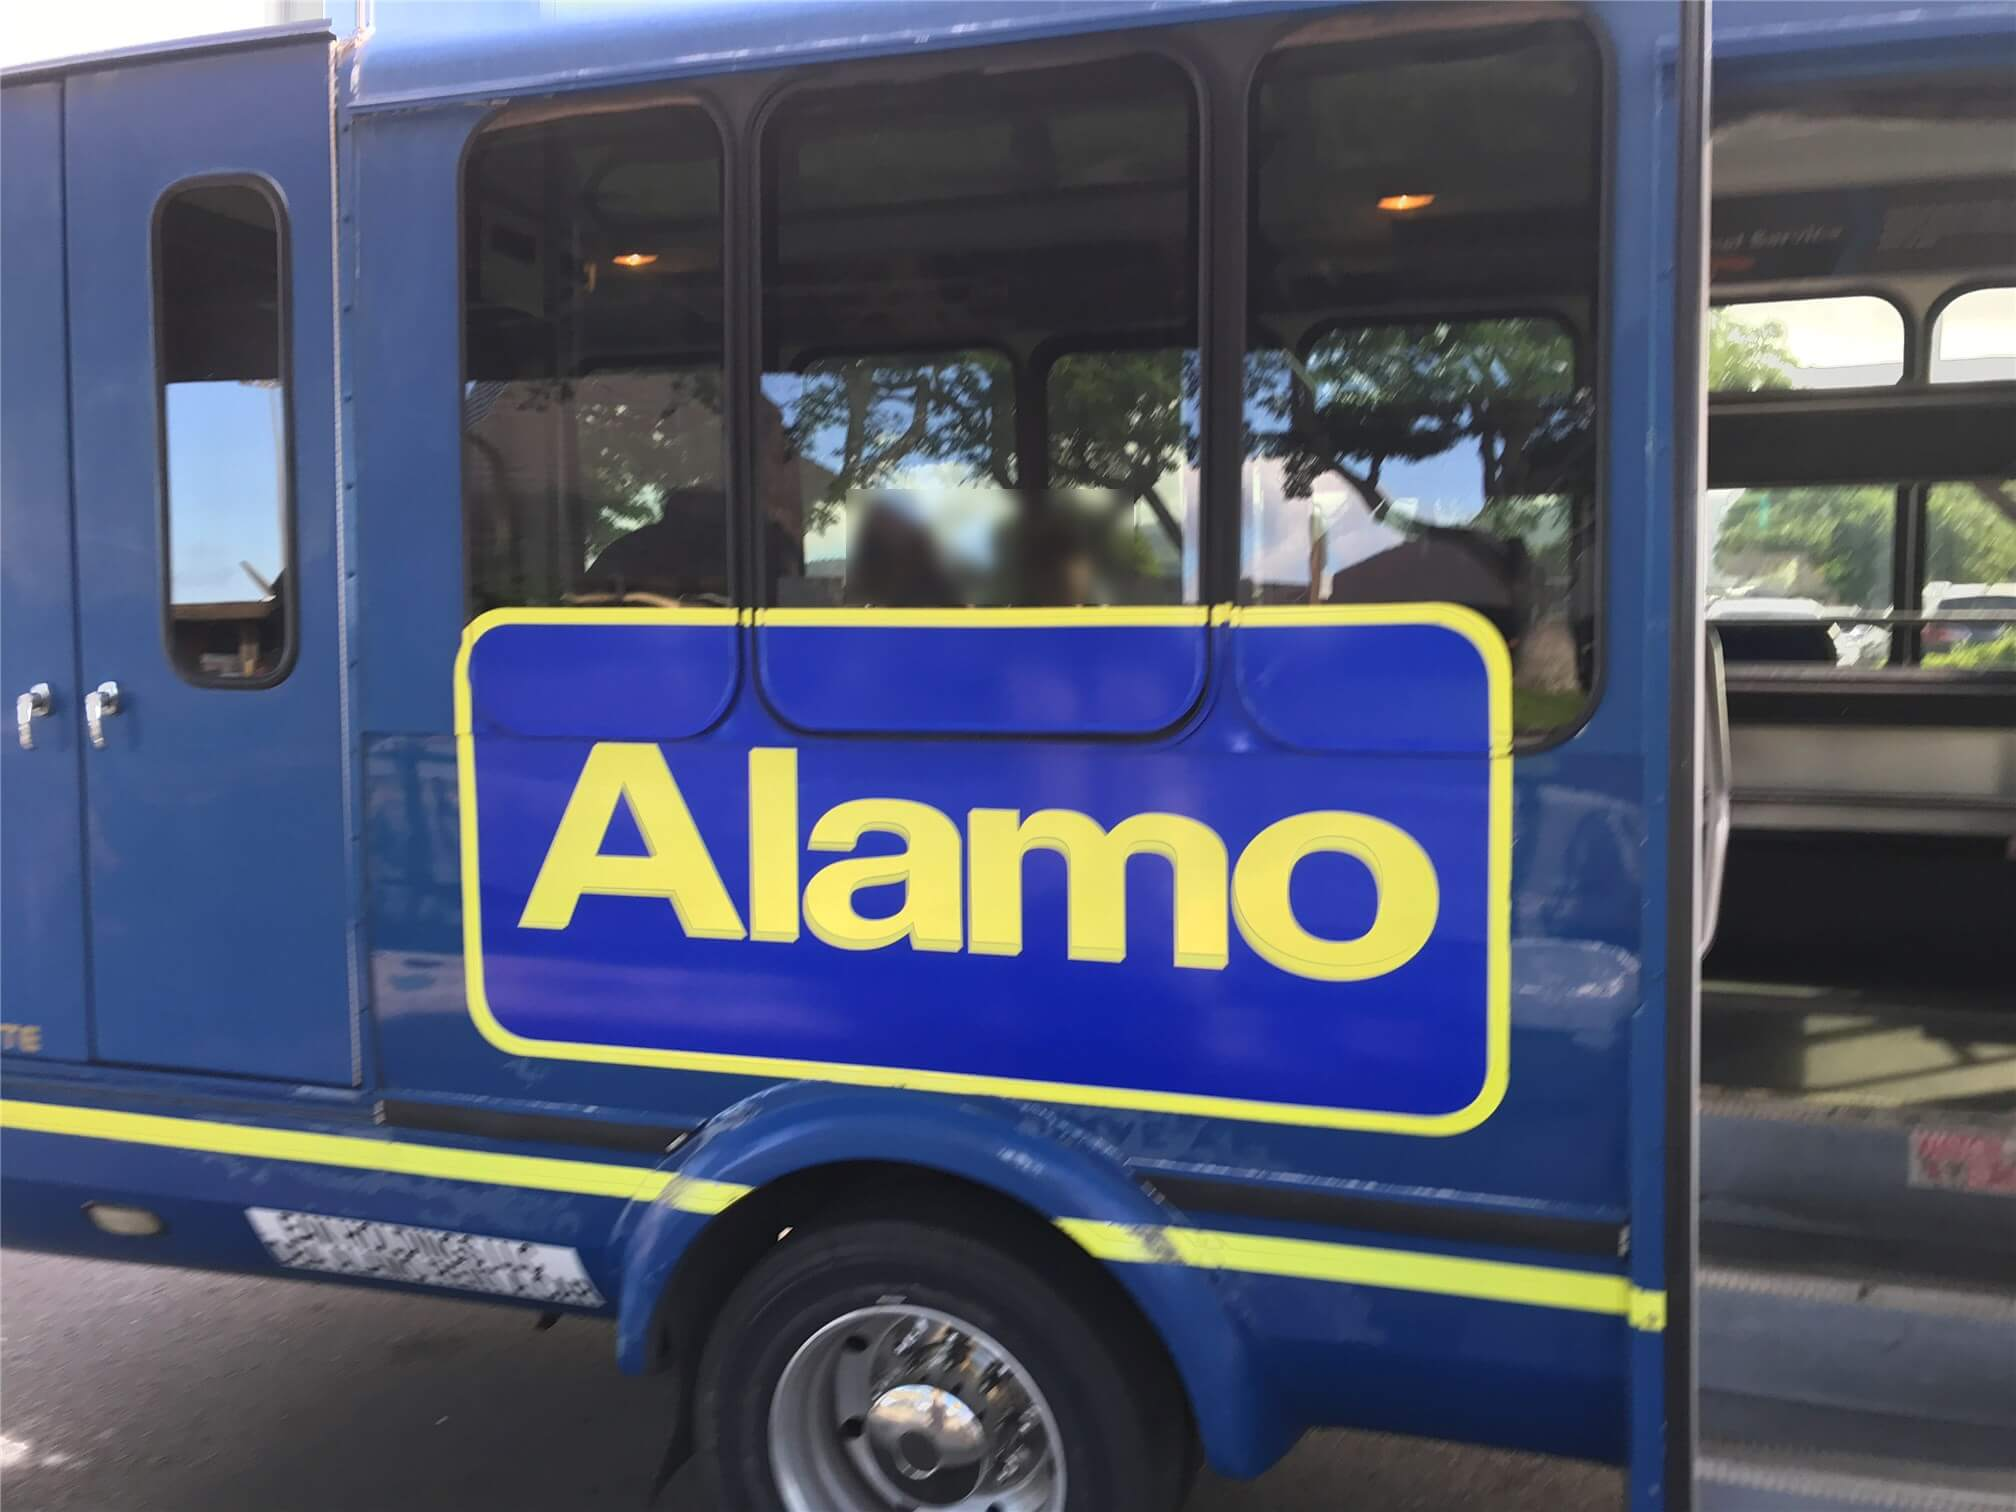 kona airport alamo bus1